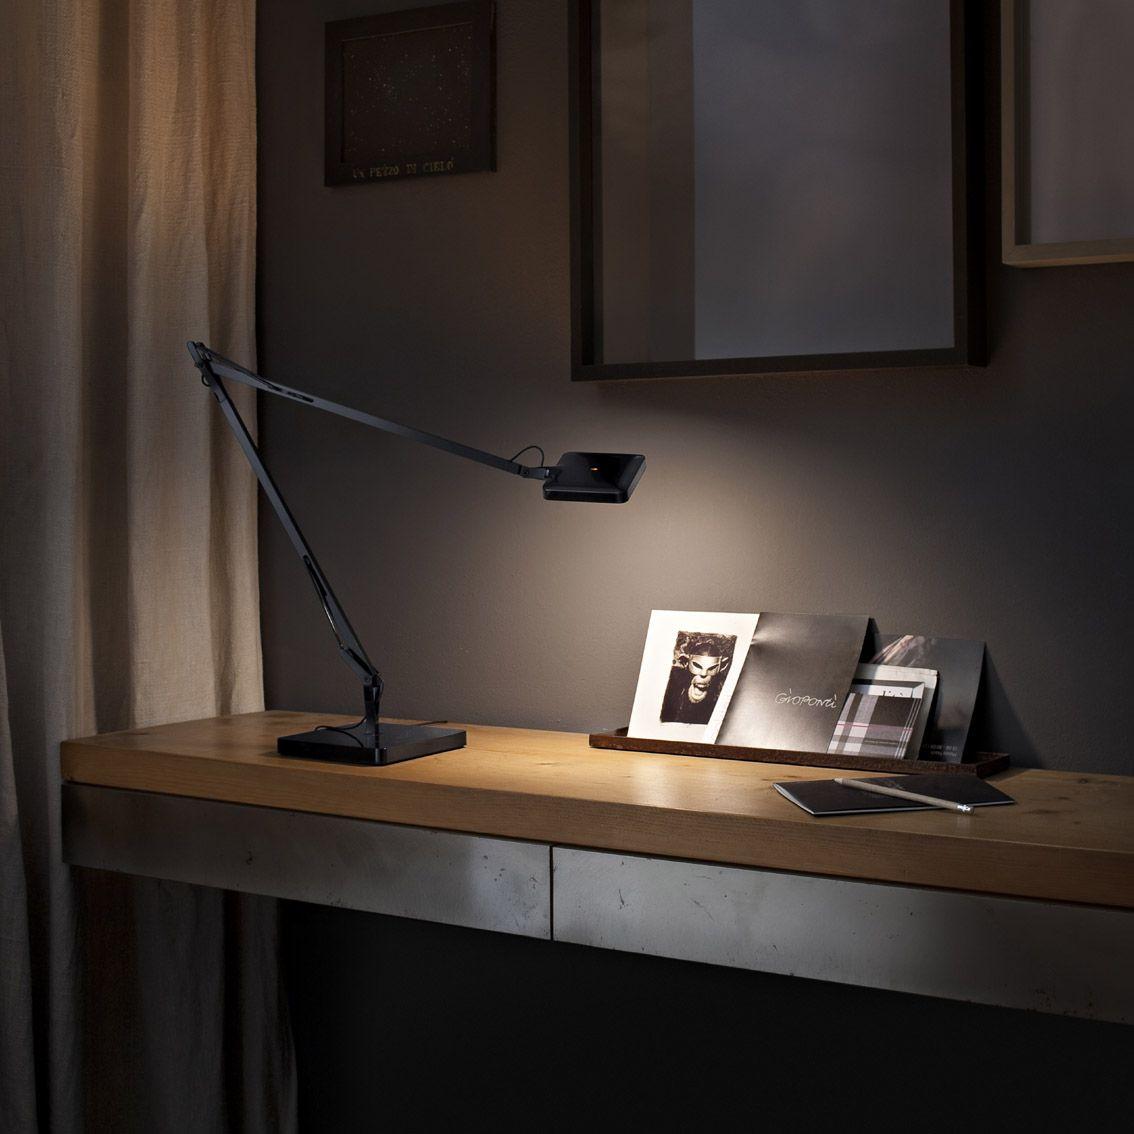 Kelvin Led Green Mode I Table Lamp With Light Adjusting Sensor Flos Table Lamps Adjustable Desk Lamps Table Lamp